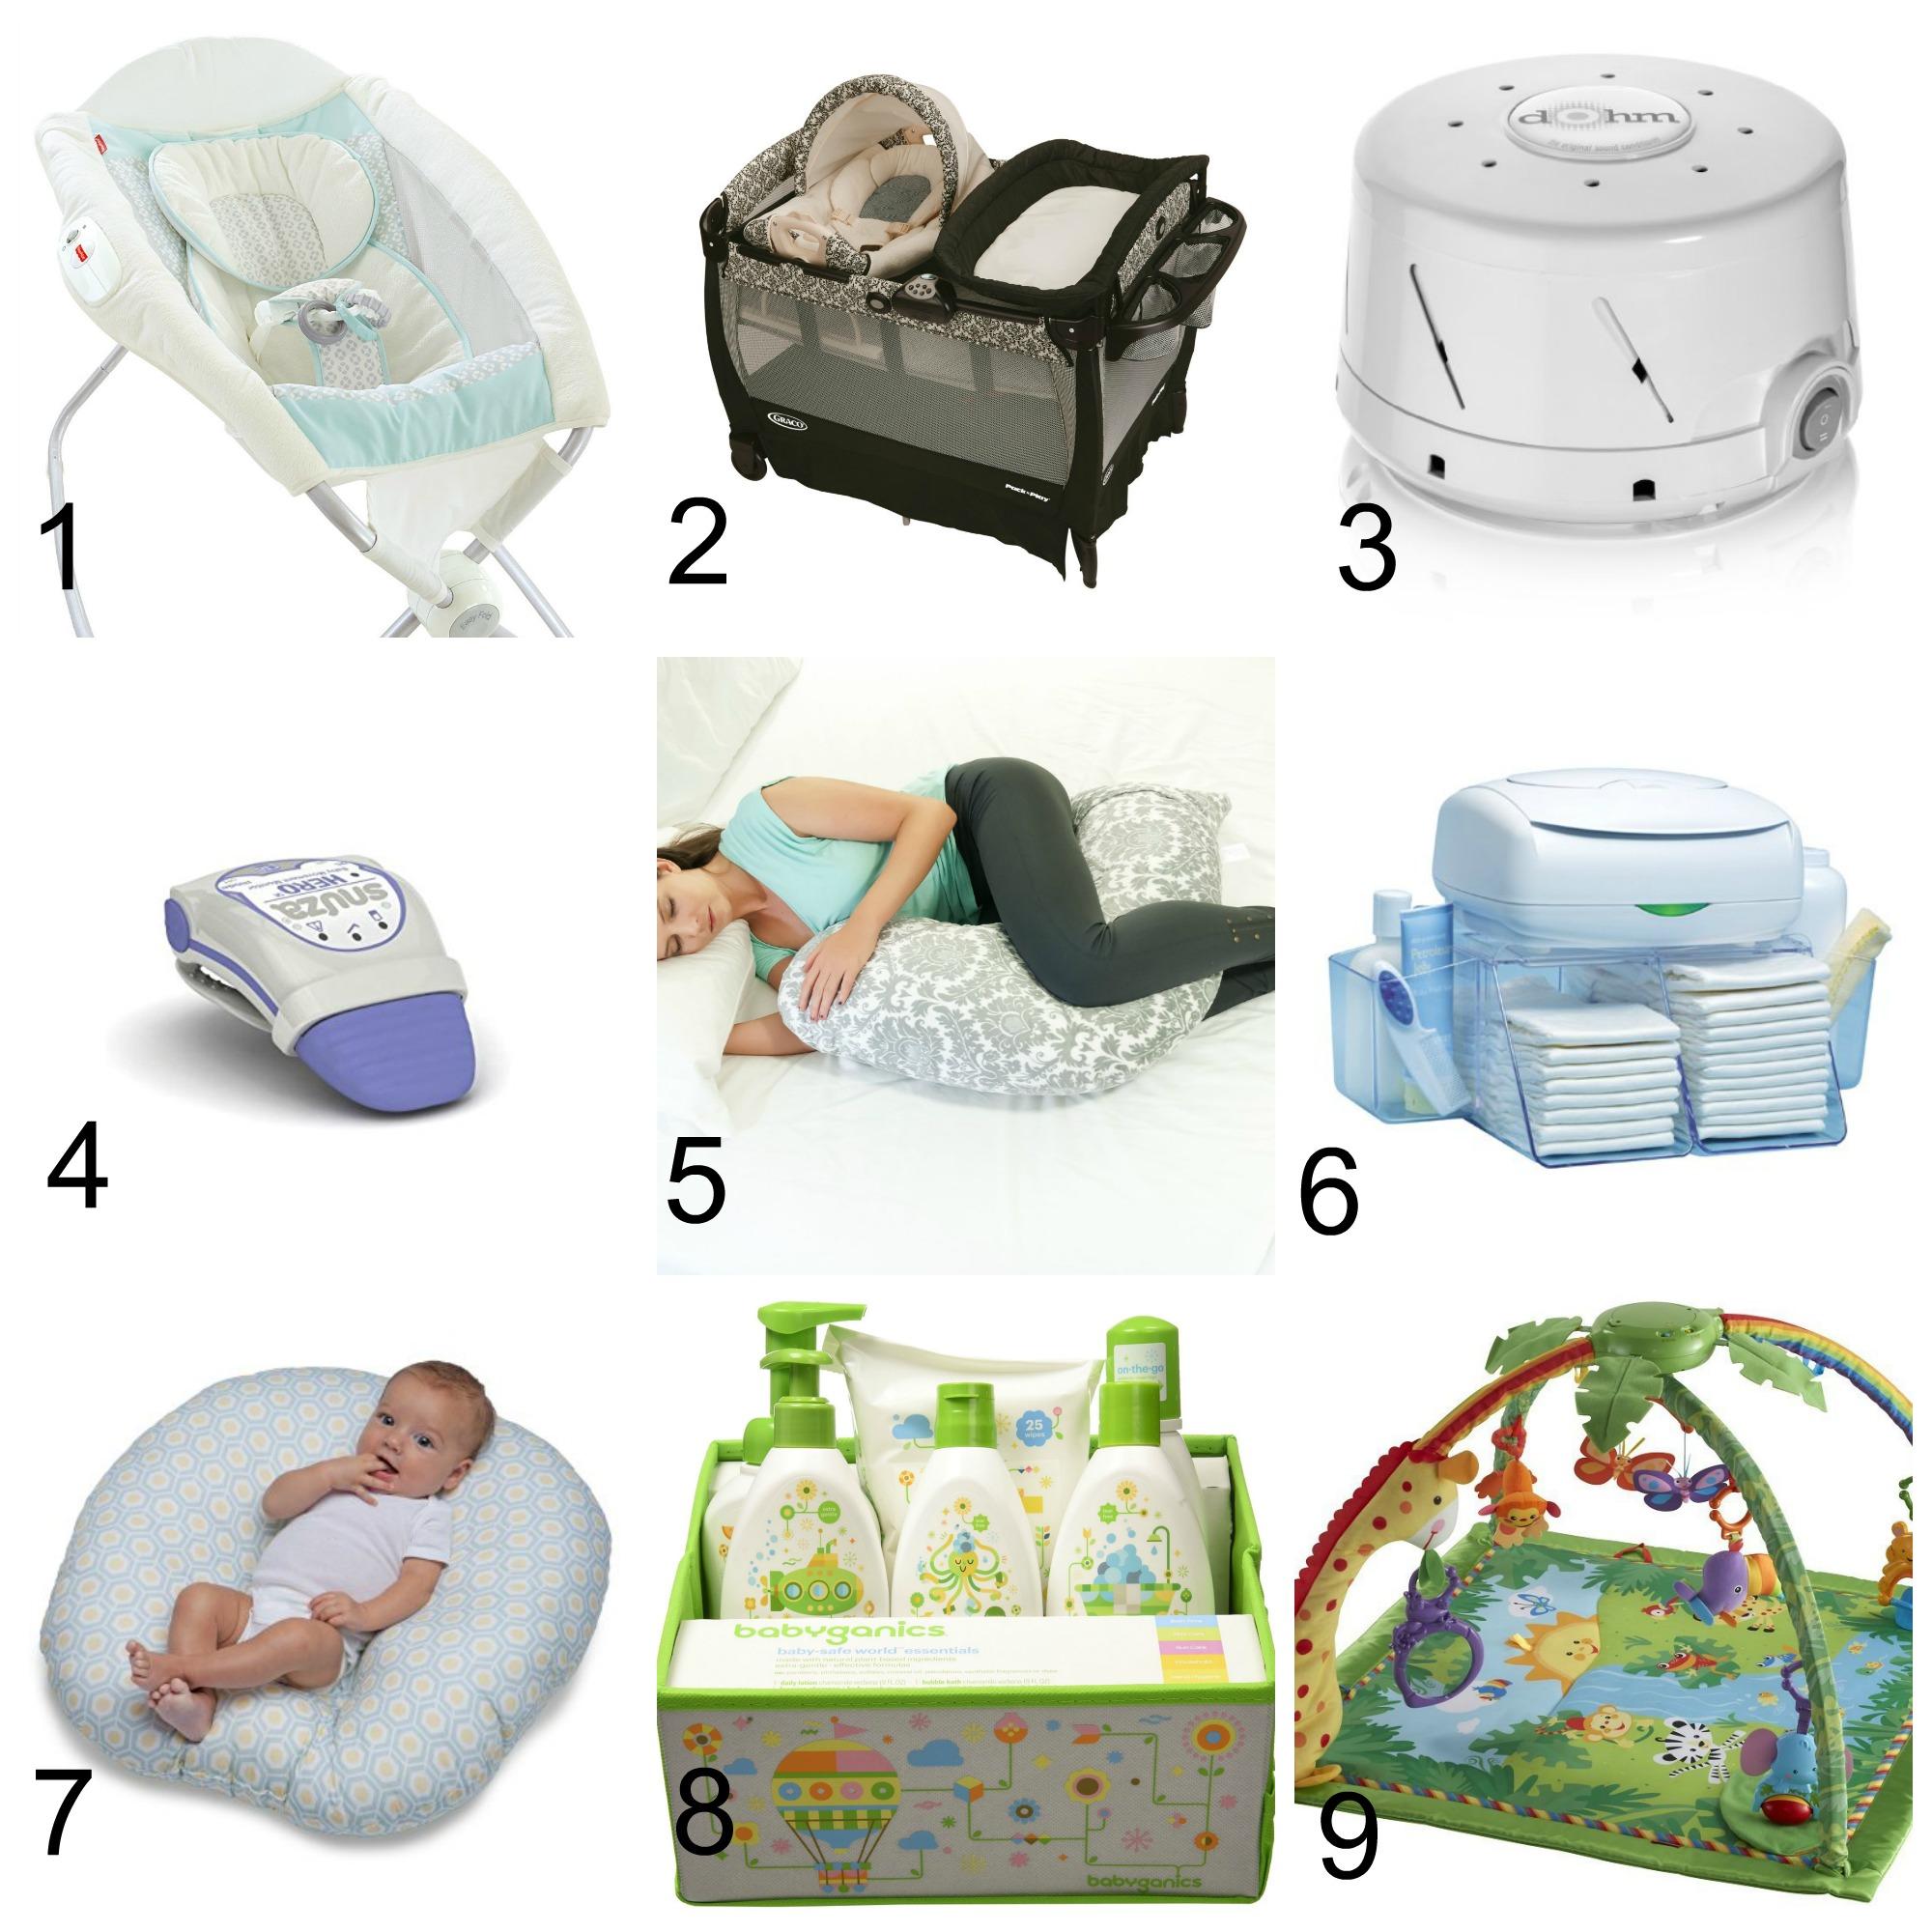 My Baby Registry List Hello Militello